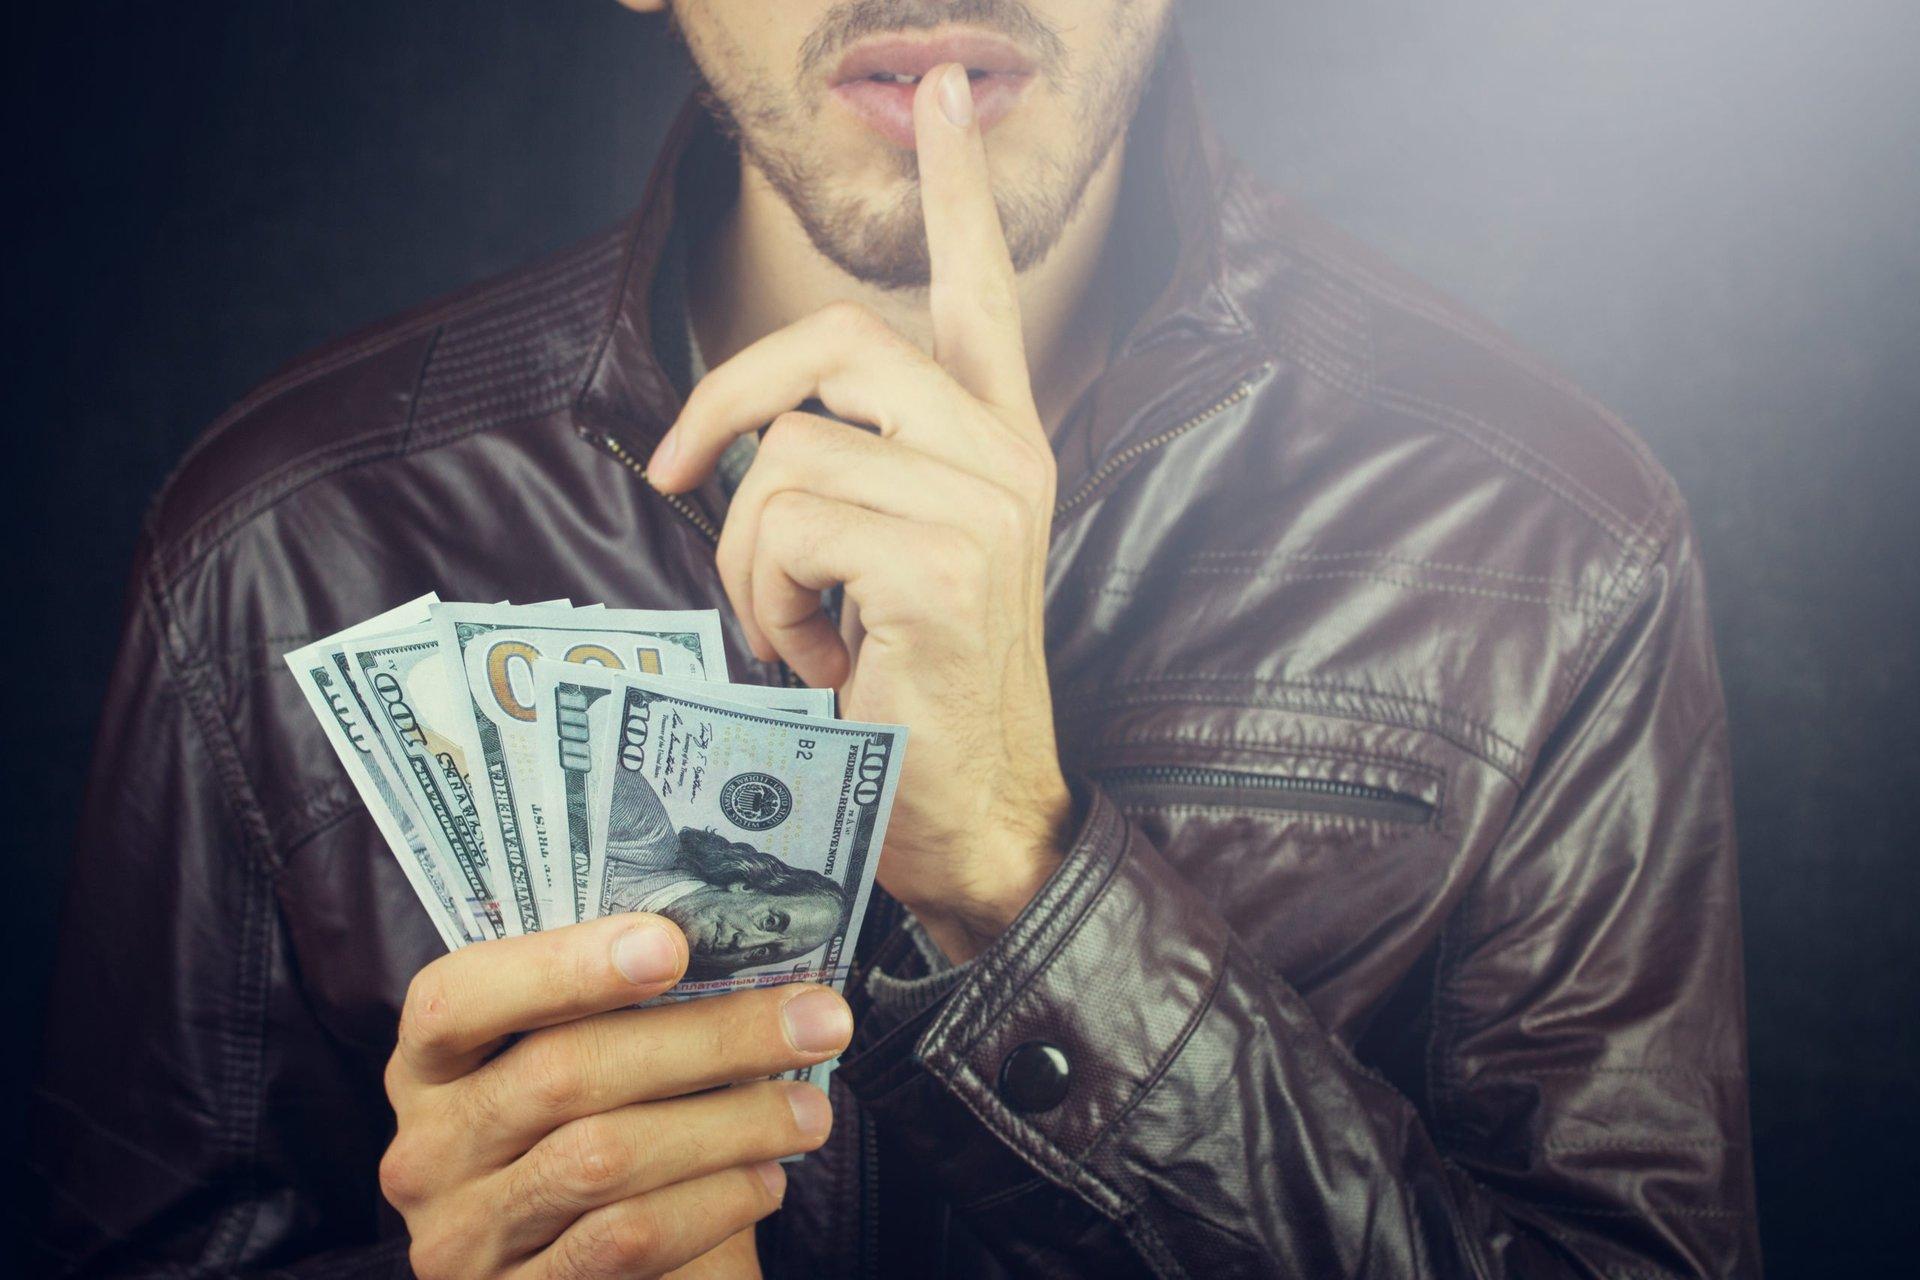 Man with hush money